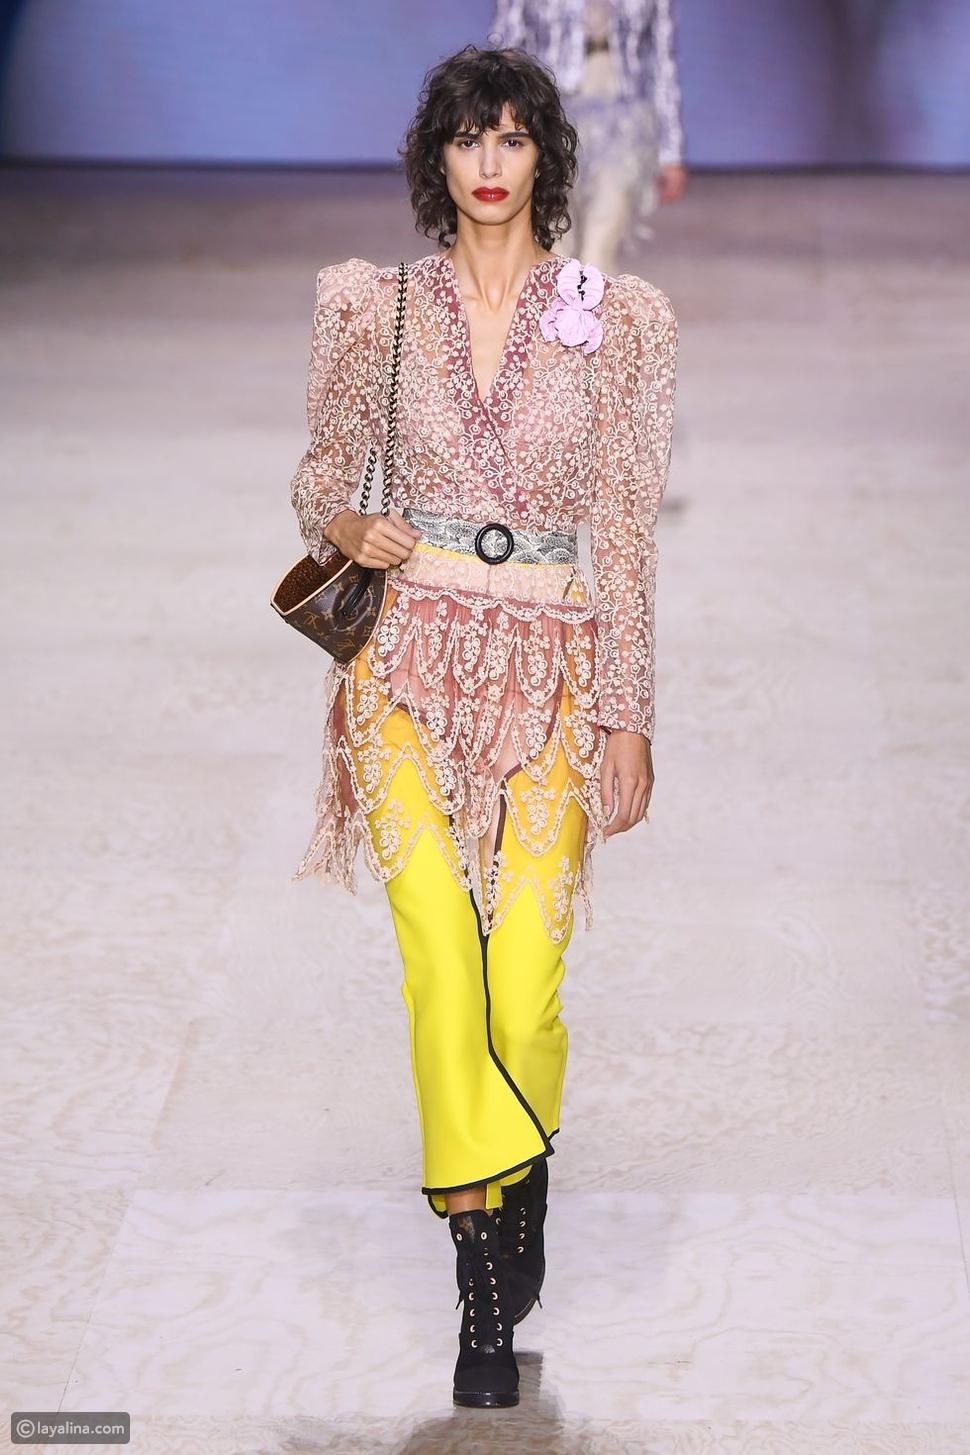 لوي فيتونLouis Vuitton ربيع وصيف 2020